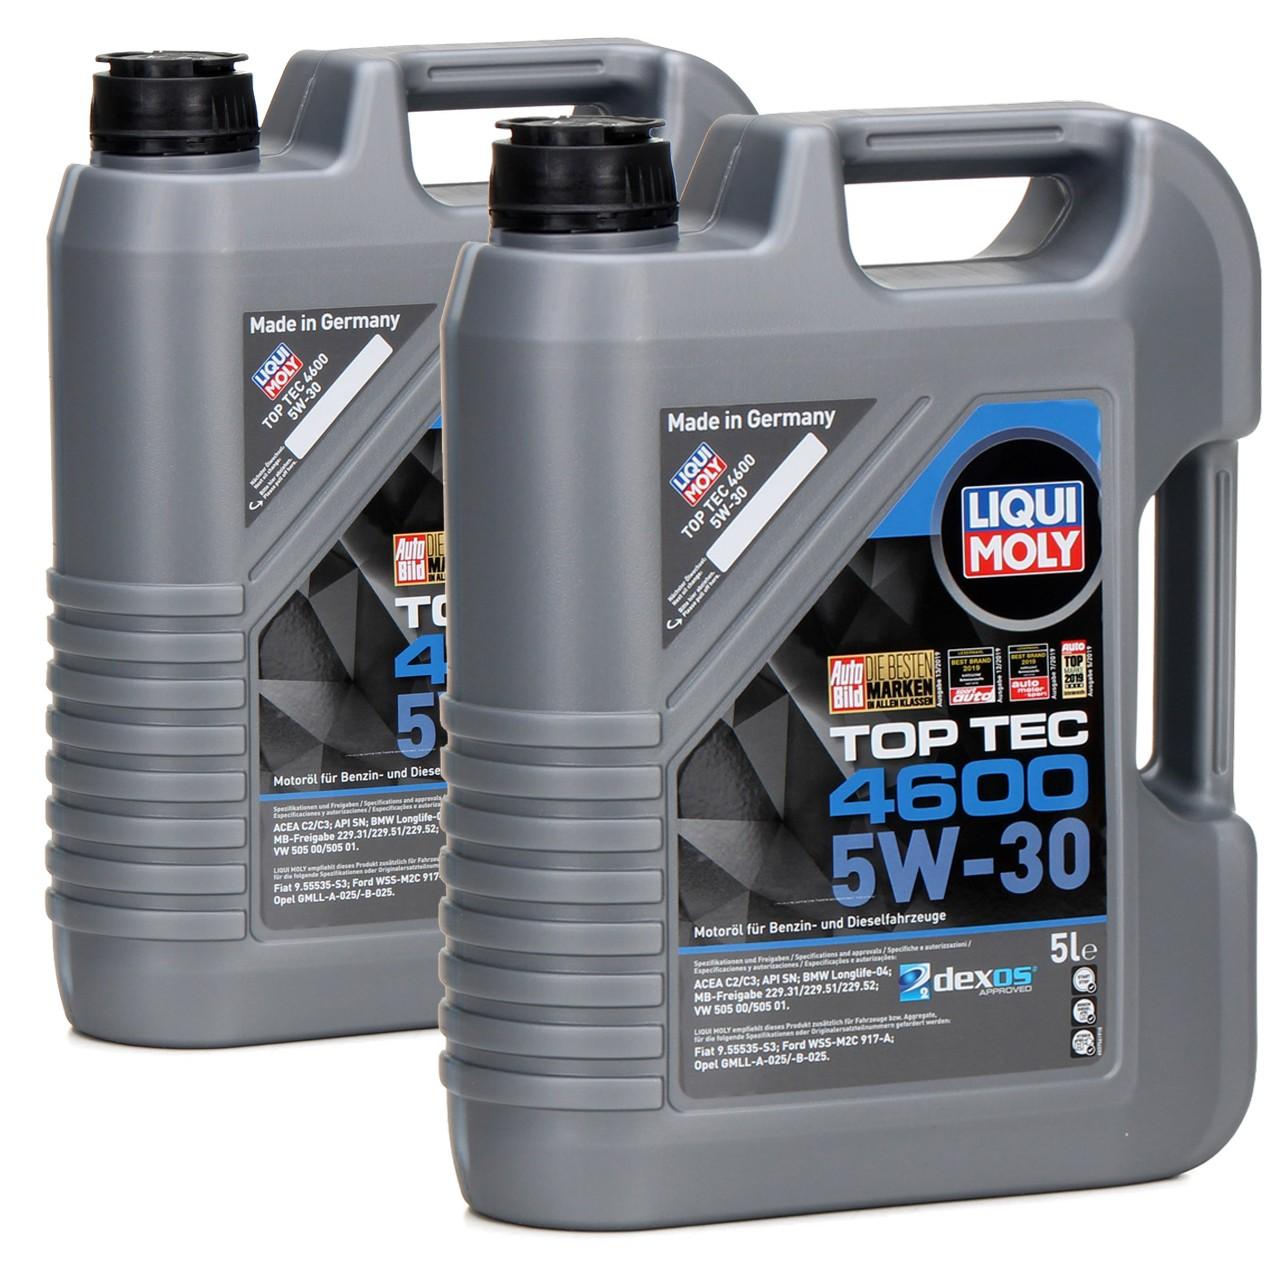 LIQUI MOLY Motoröl 5W30 TOP TEC 4600 dexos2 BMW LL-04 VW 505.00/01 - 10 Liter